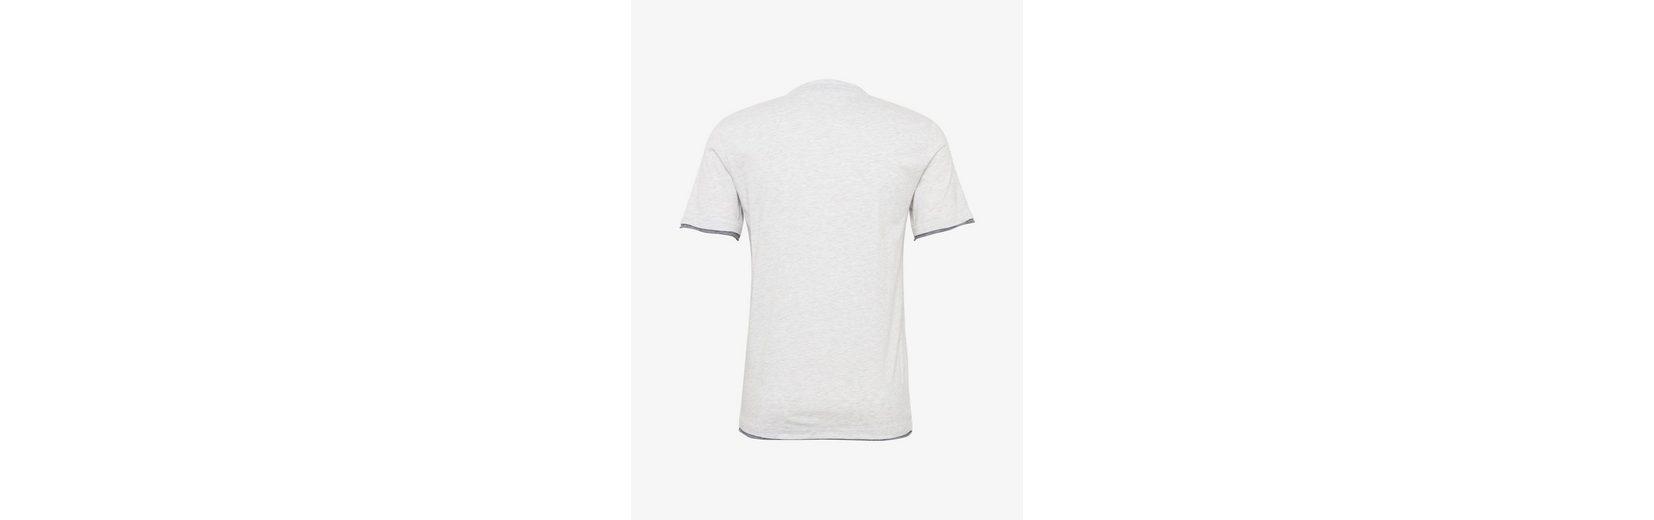 Tom Tailor T-Shirt T-Shirt in Melange-Optik Visa-Zahlung Günstig Online UlX7Q2CEg